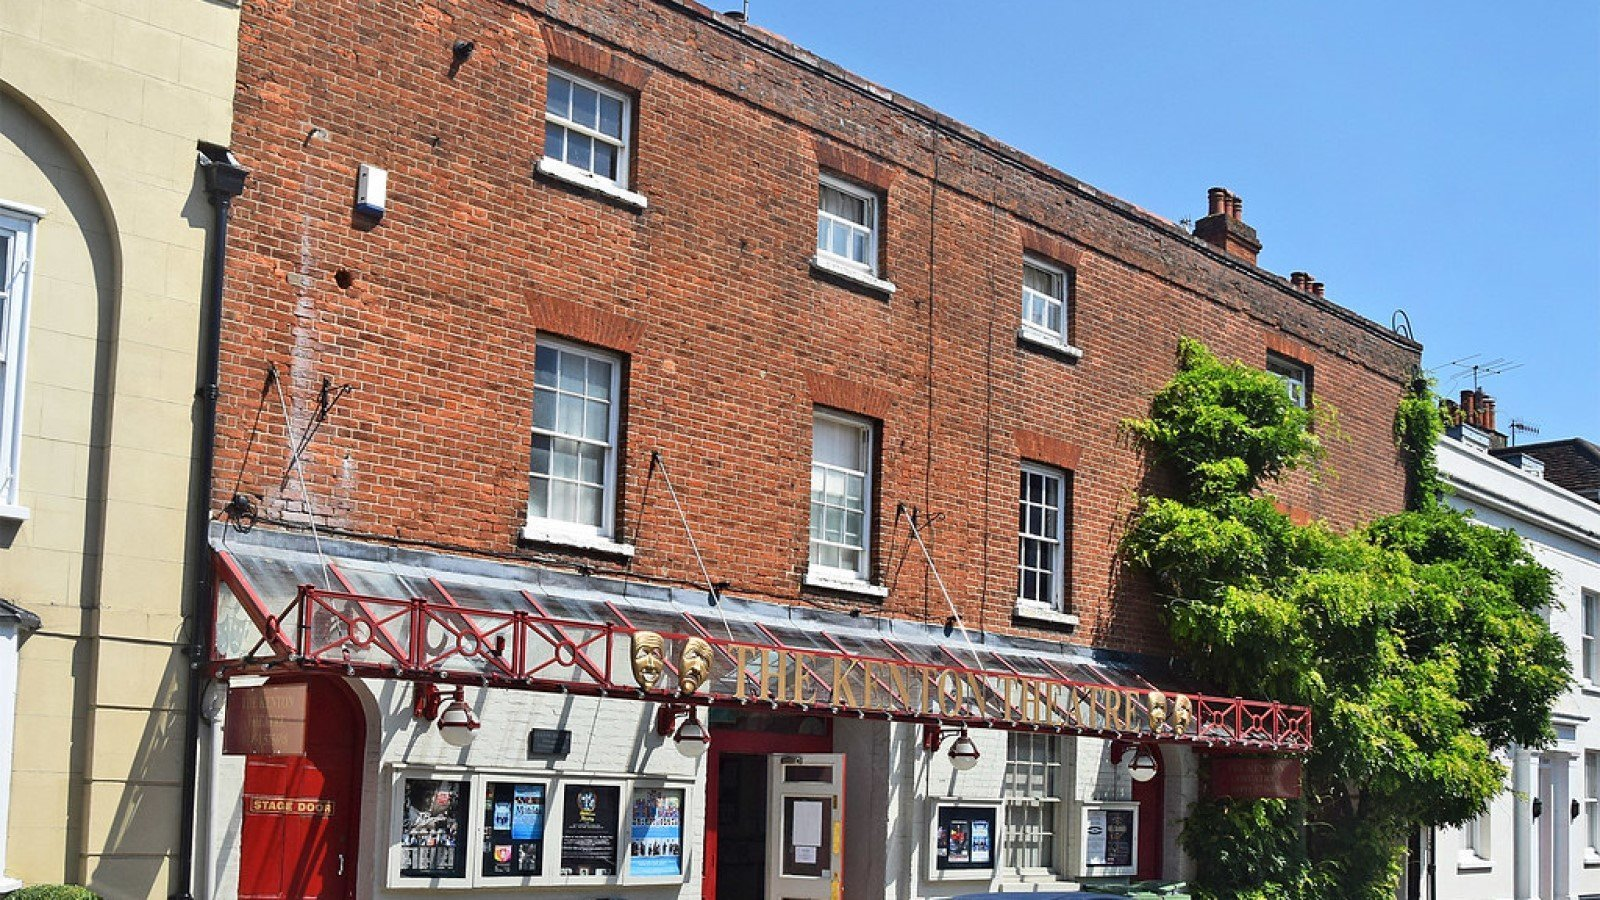 Kenton Theatre, Henley-on-Thames